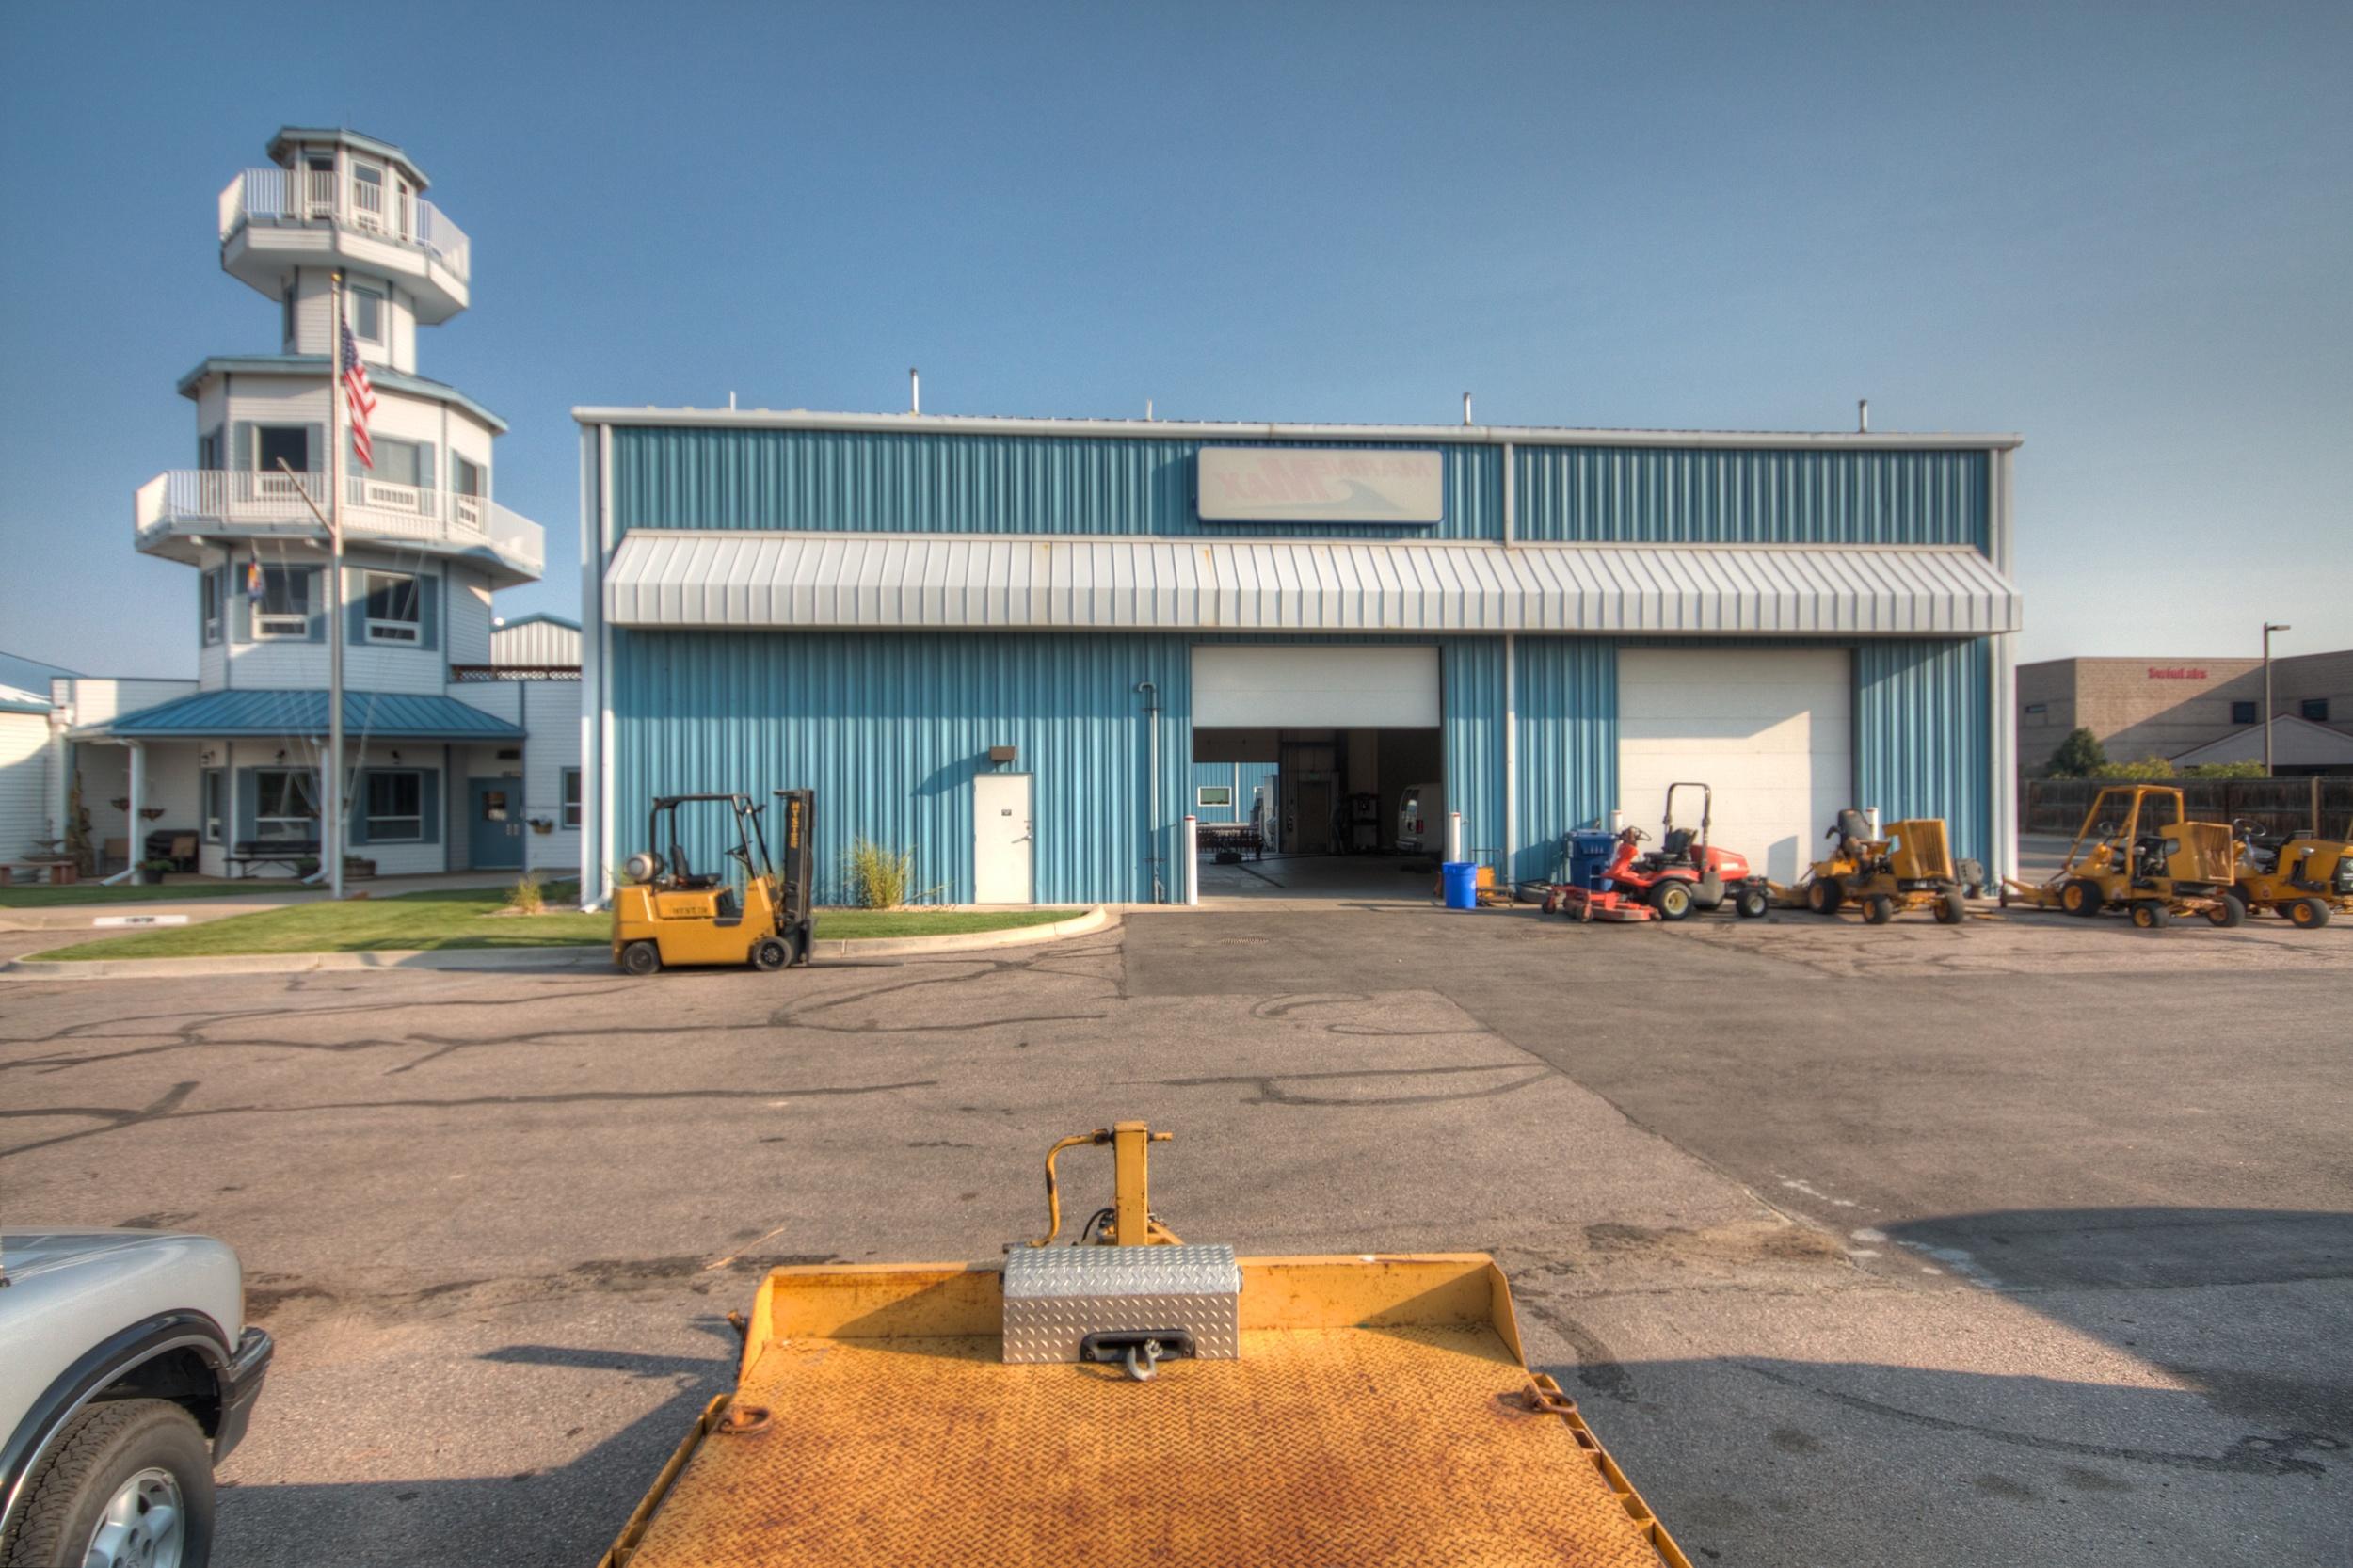 South Suburban Parks and Rec Fleet Maintenance